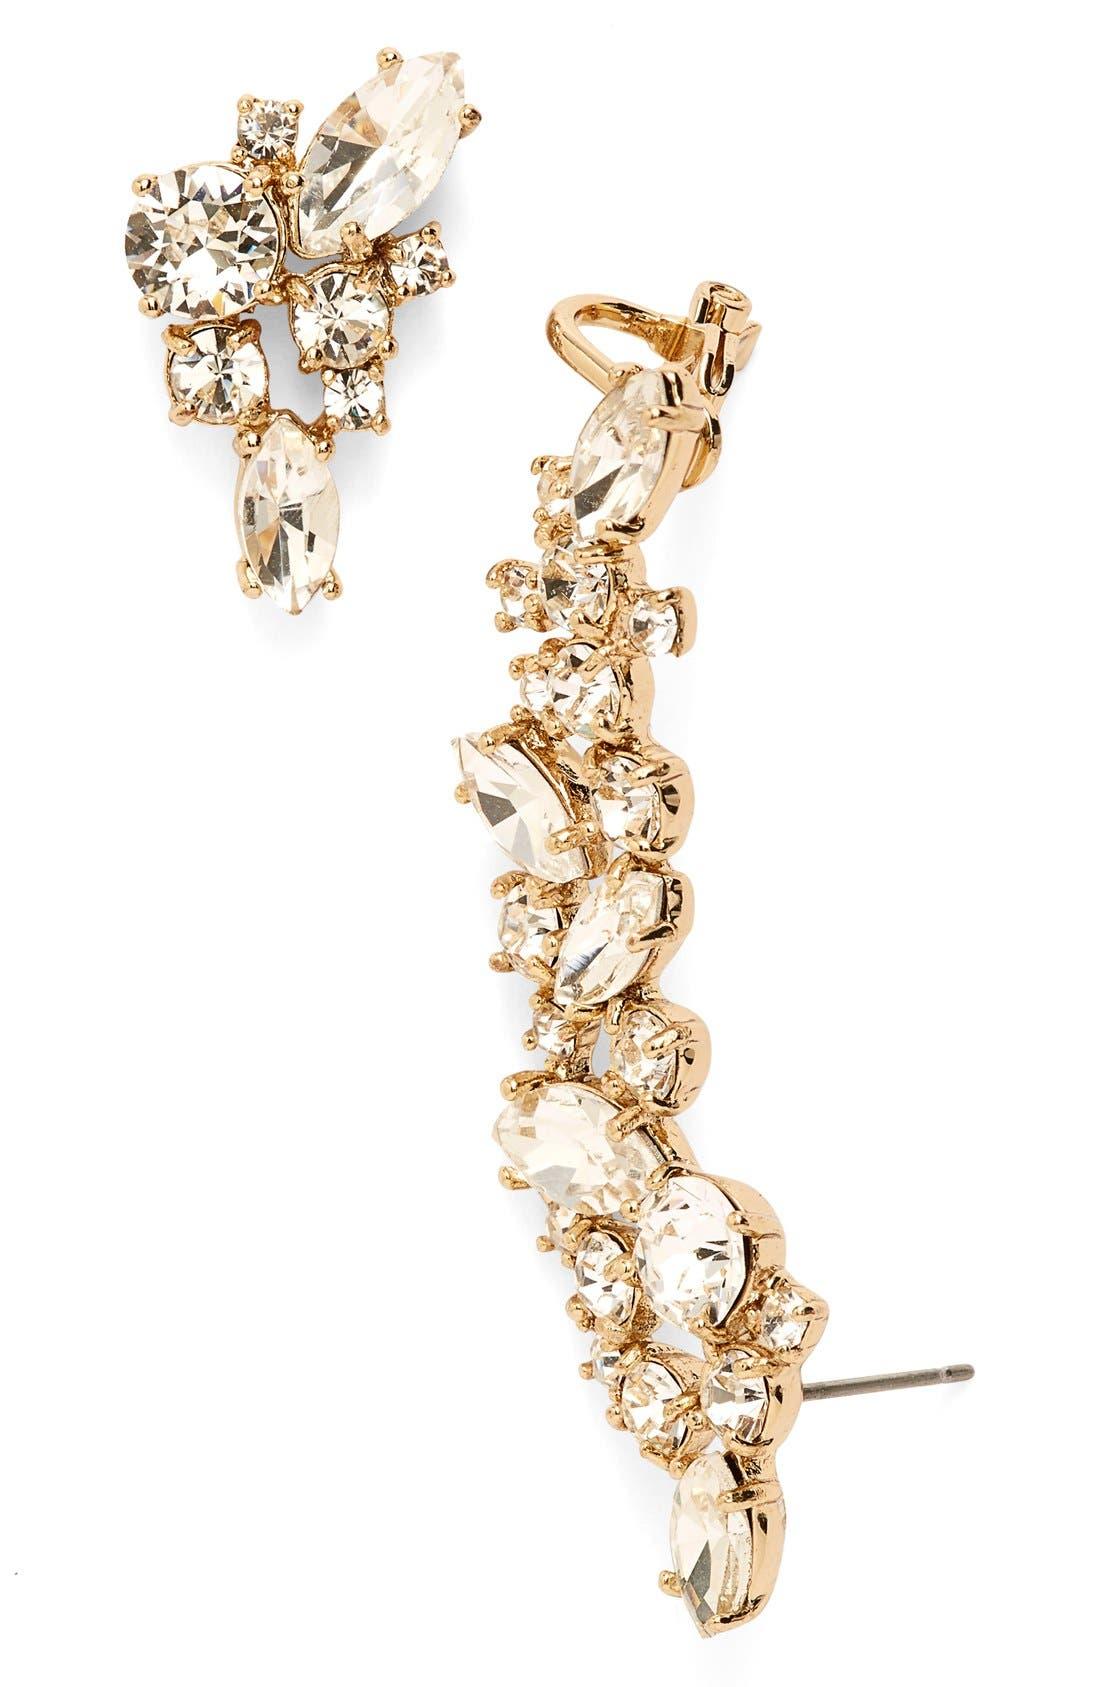 Main Image - Marchesa 'Drama' Crystal Ear Crawler & Stud Earring